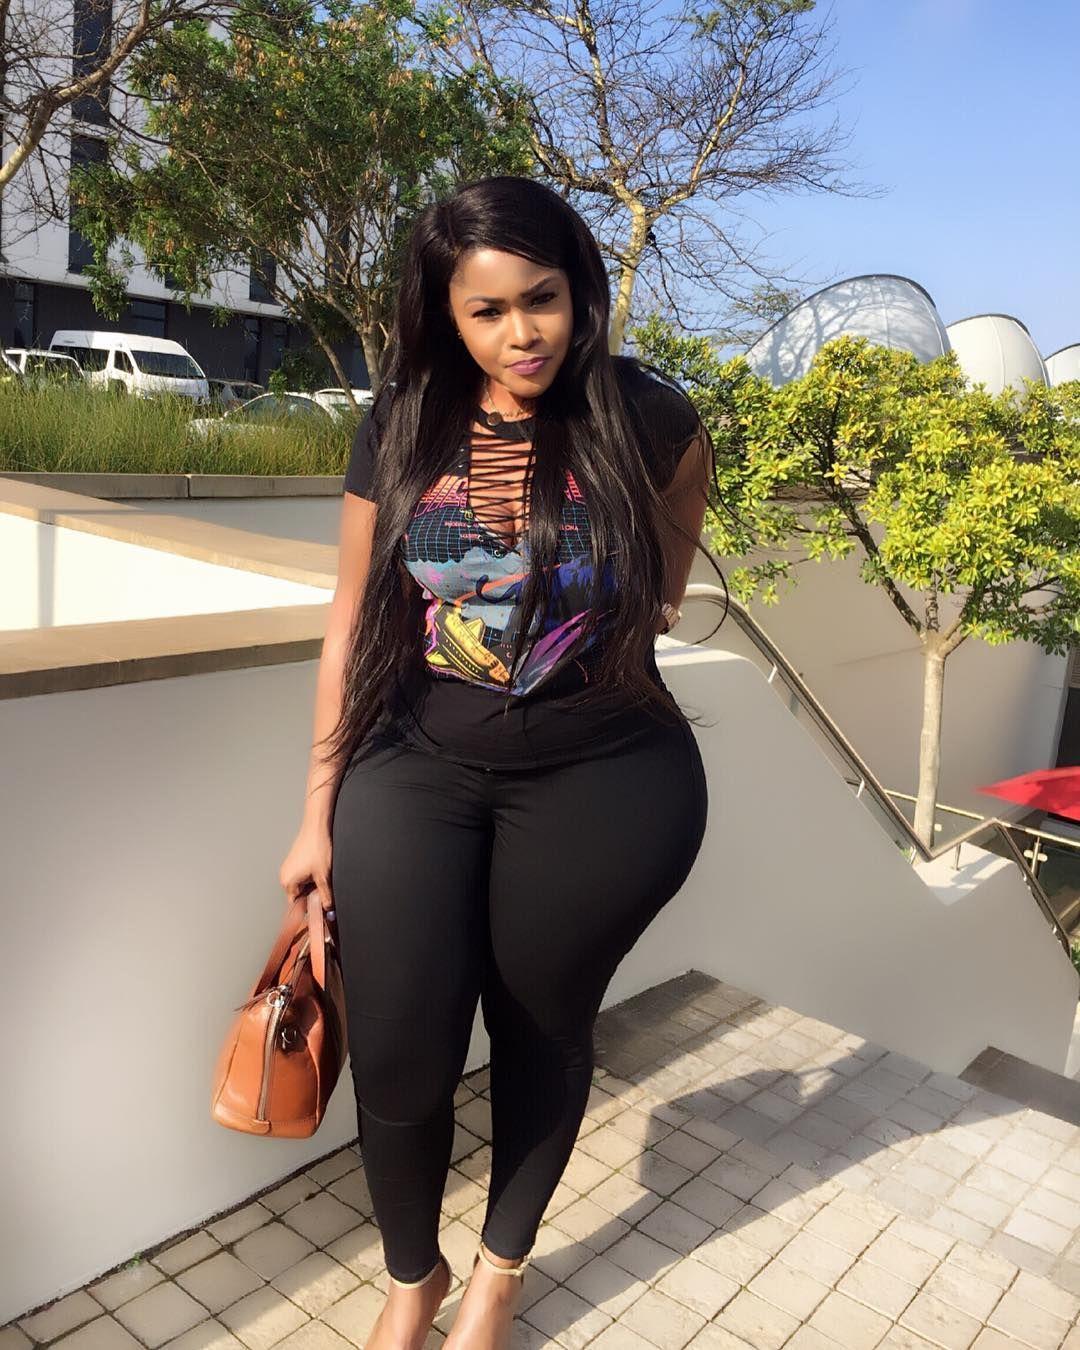 pinrik chivers on beautiful bbw black girls | pinterest | curvy